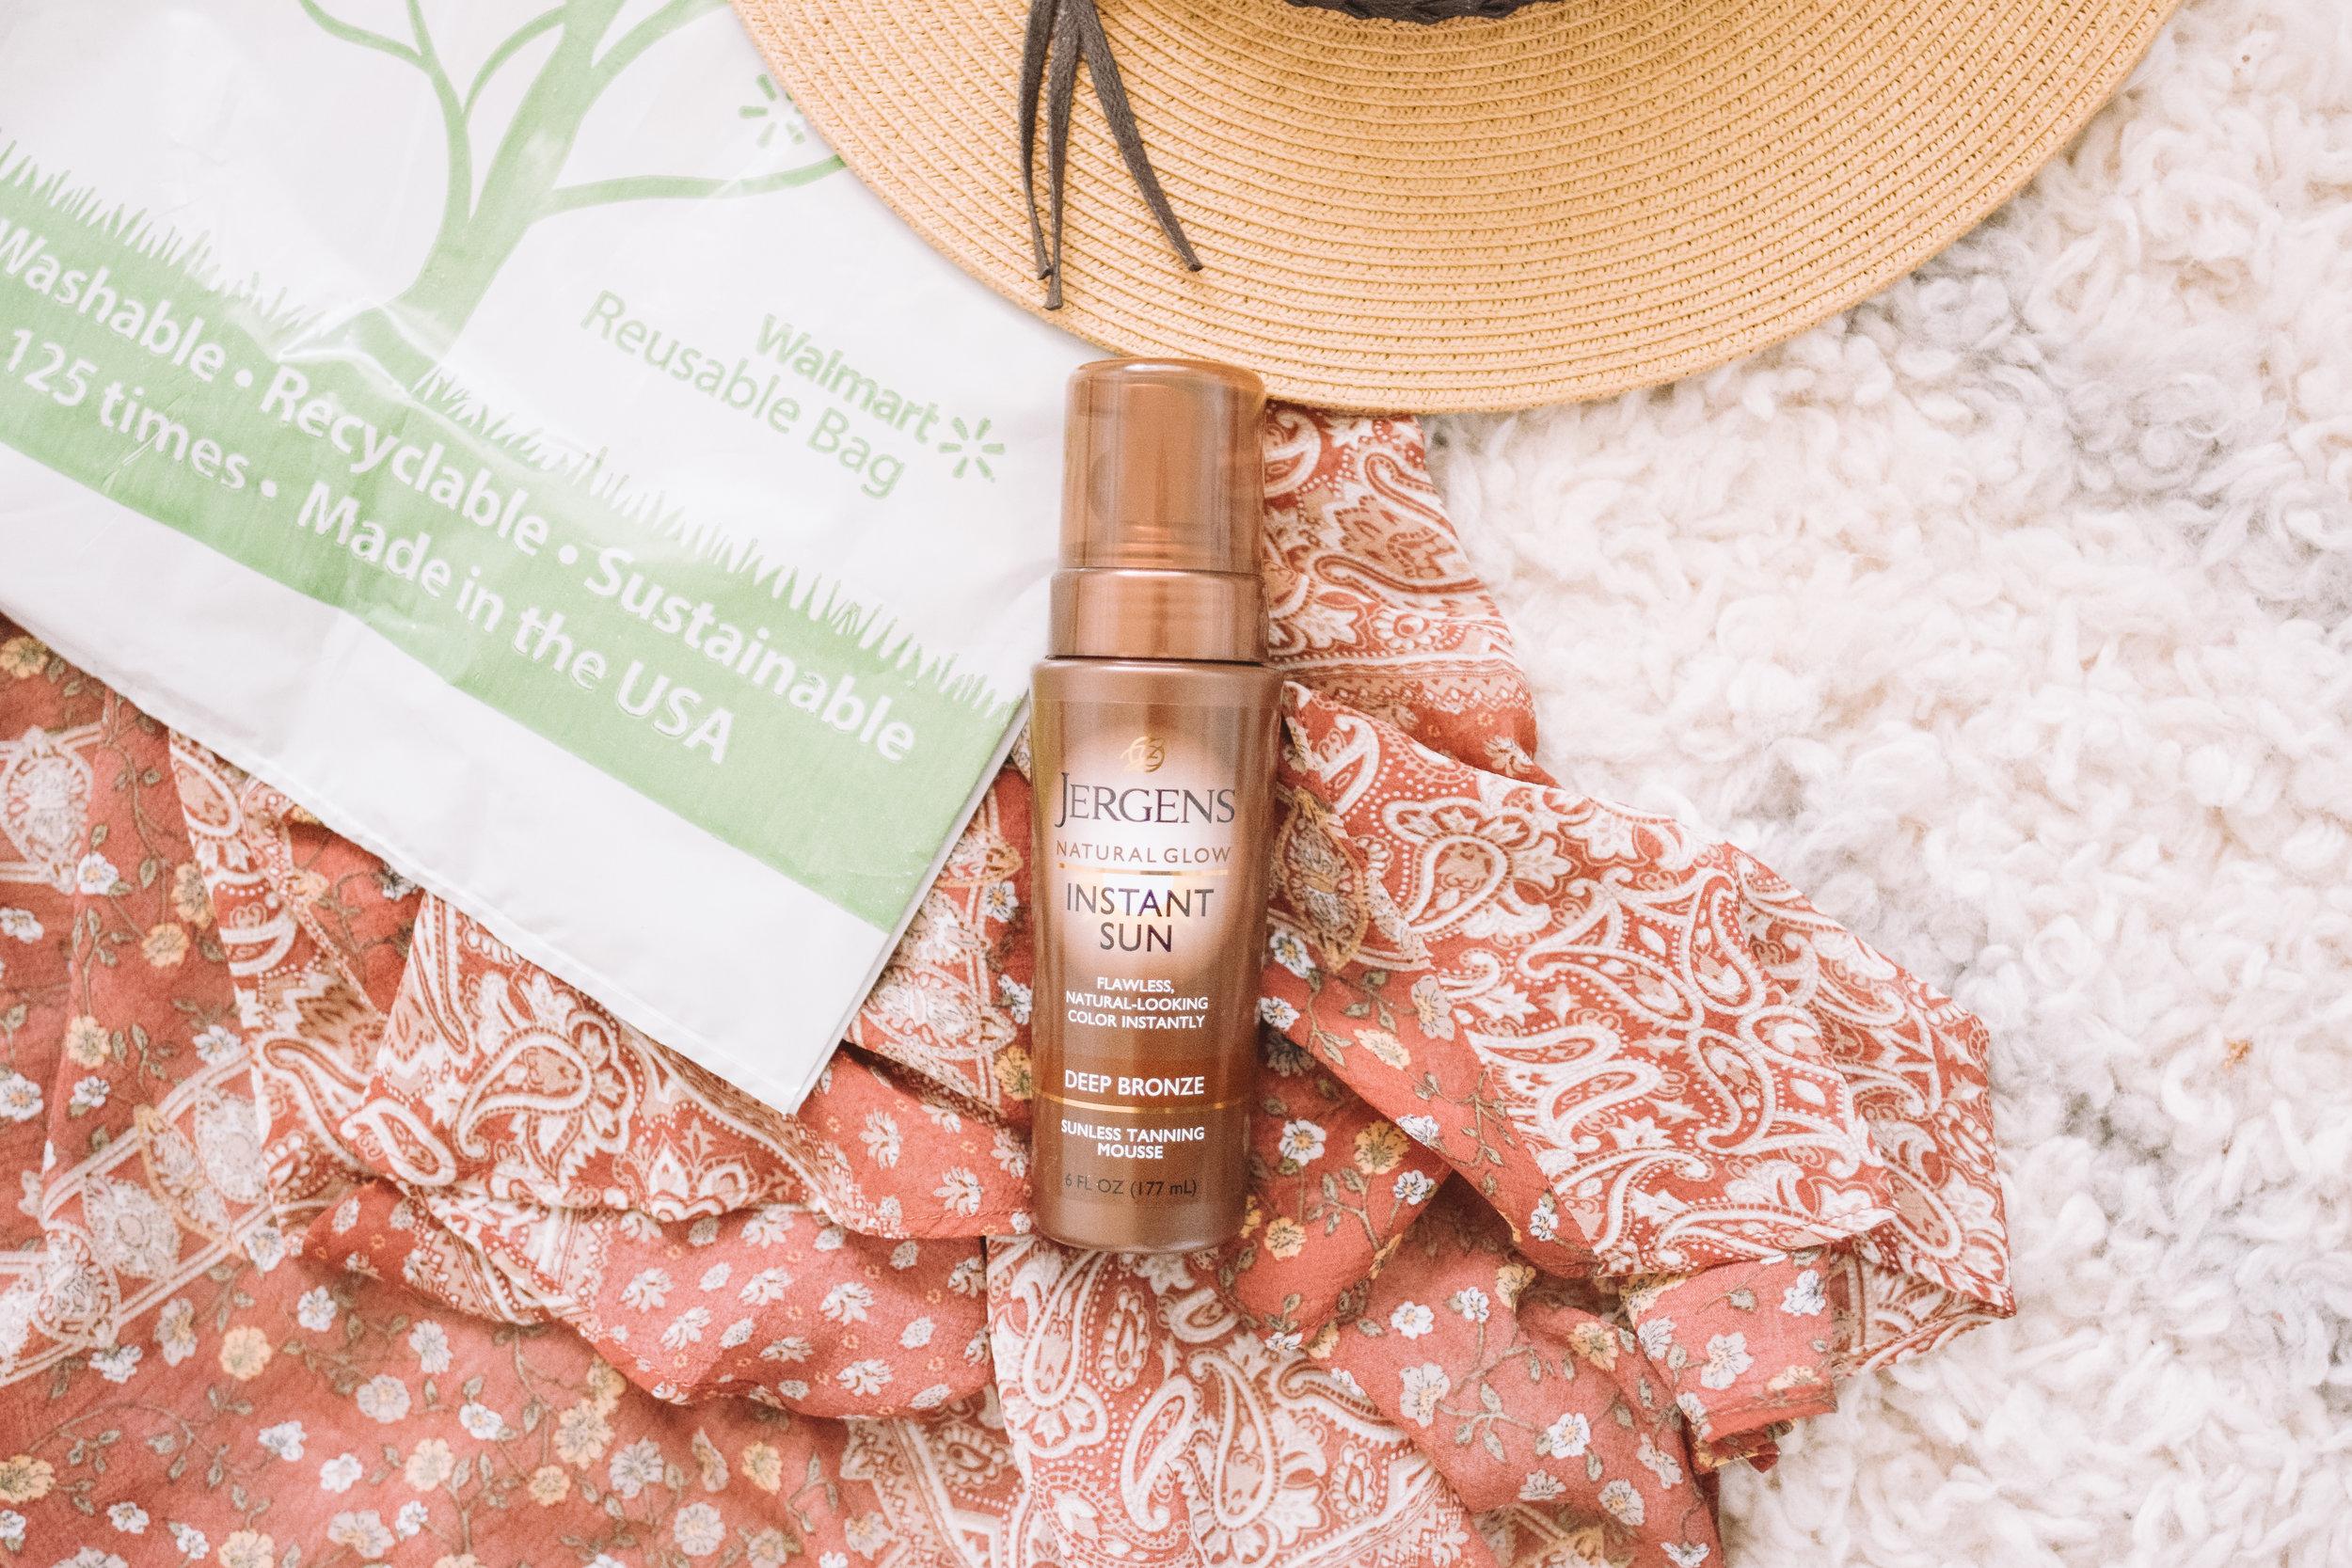 3 Summertime Essentials for New Moms - The Overwhelmed Mommy Blogger